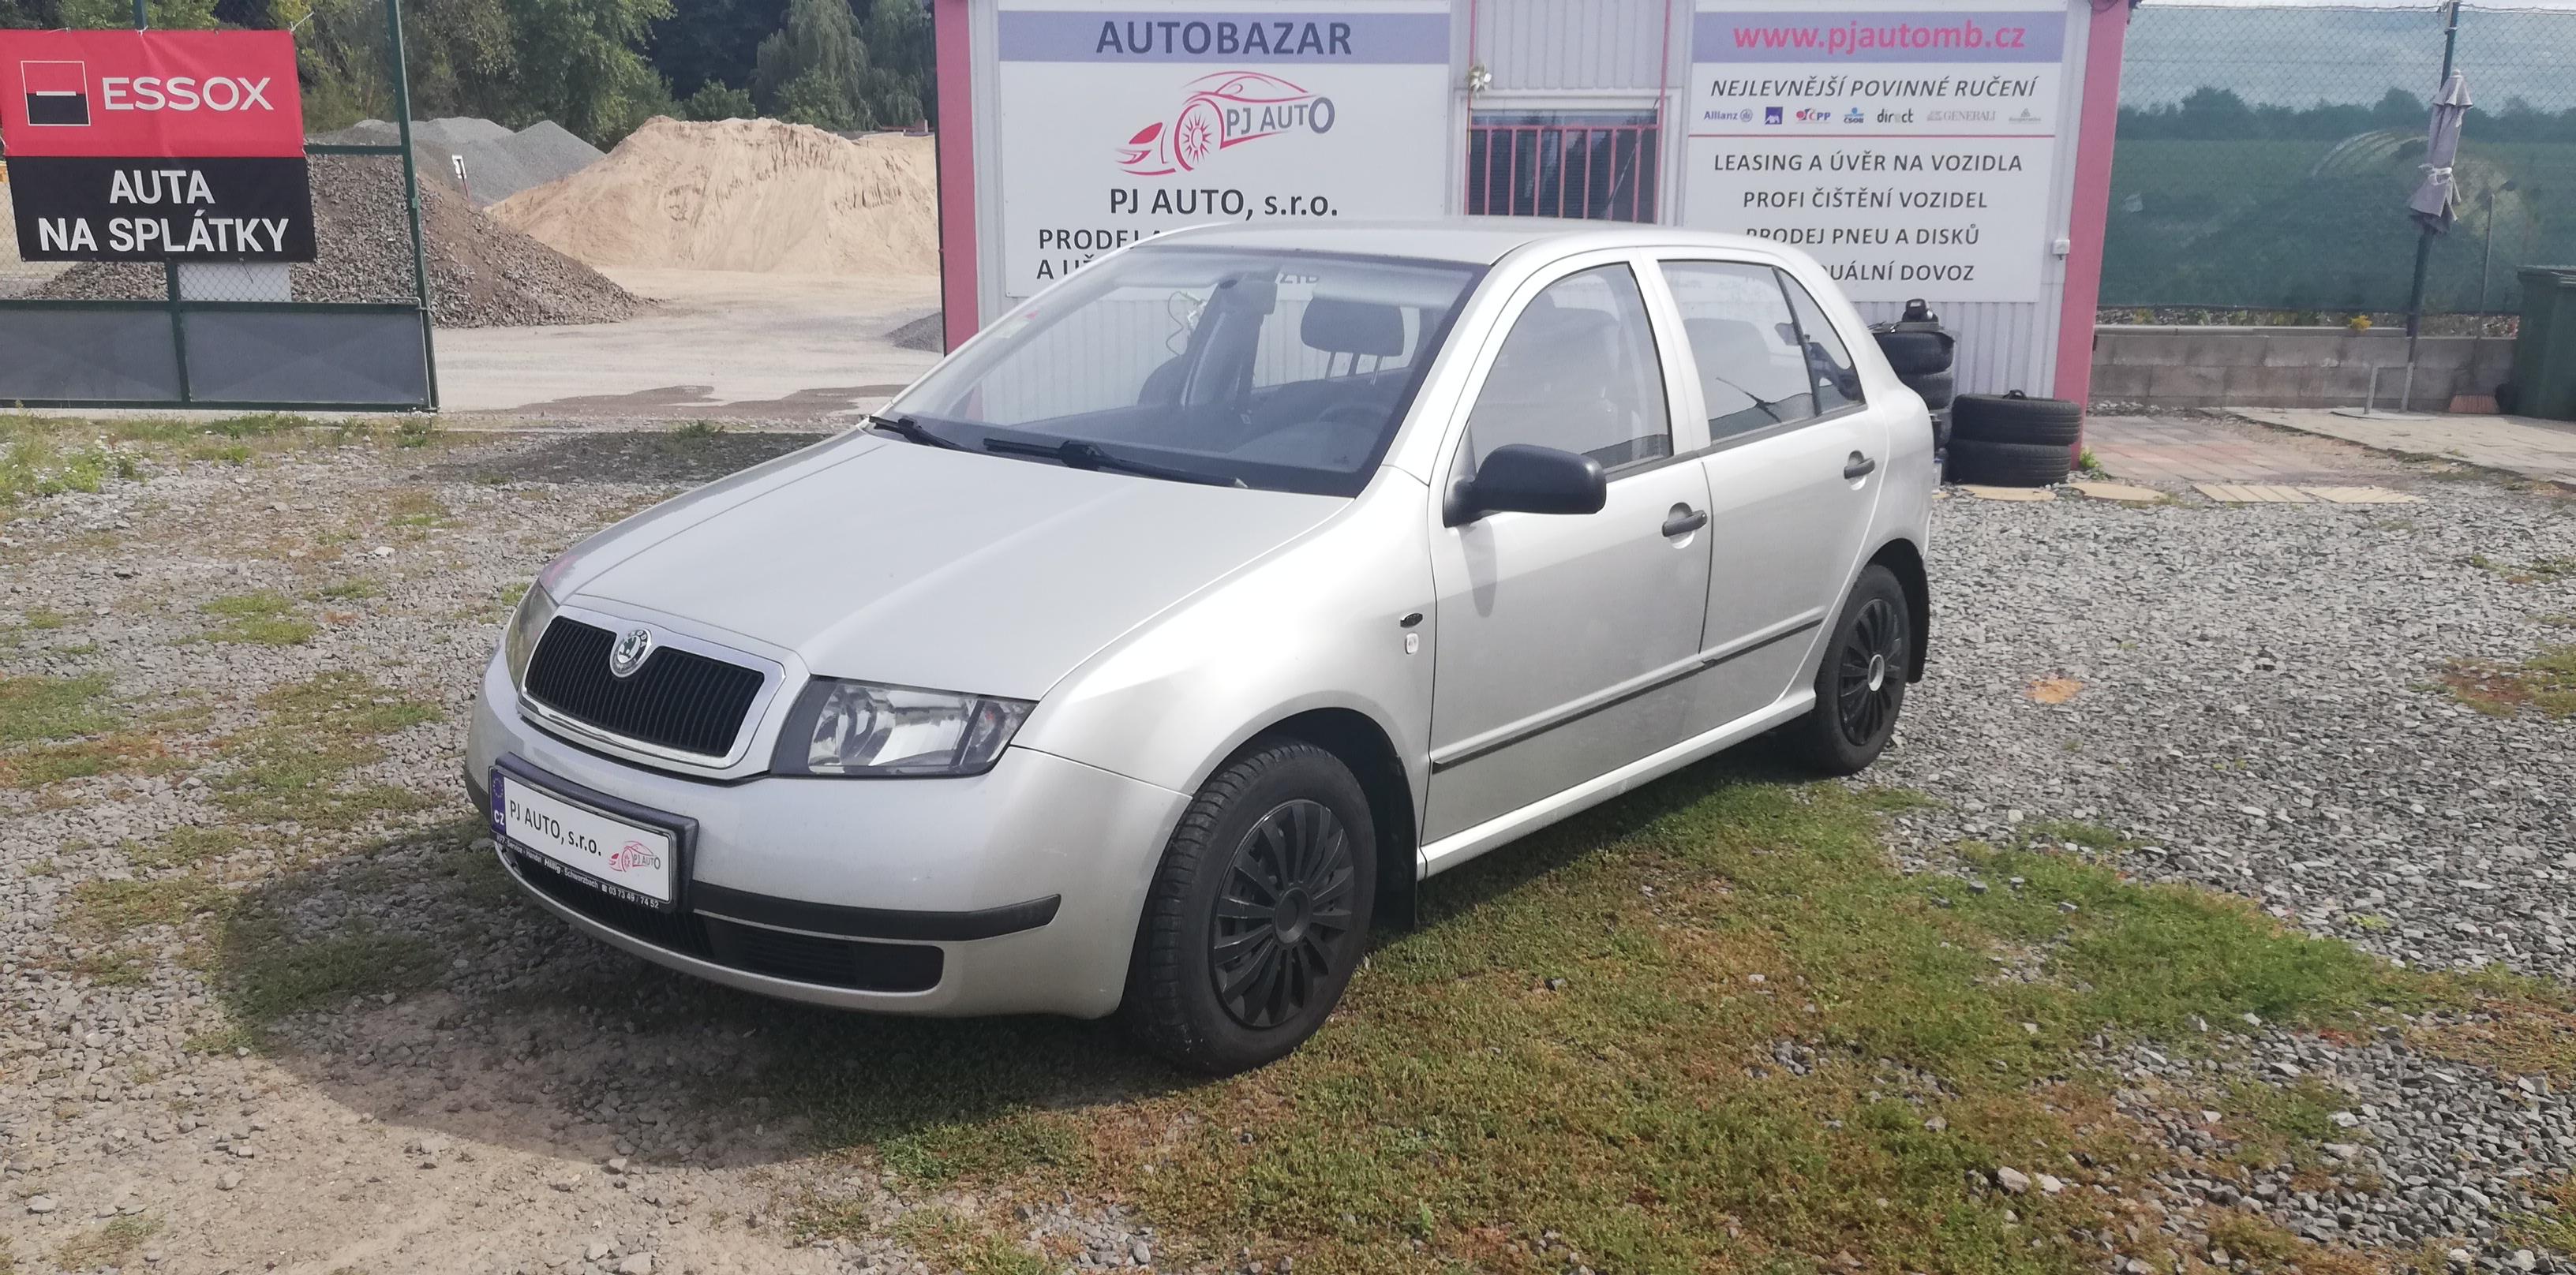 Škoda Fabia 1.4 16V 55kW Classic Servo,Tažné,Euro4